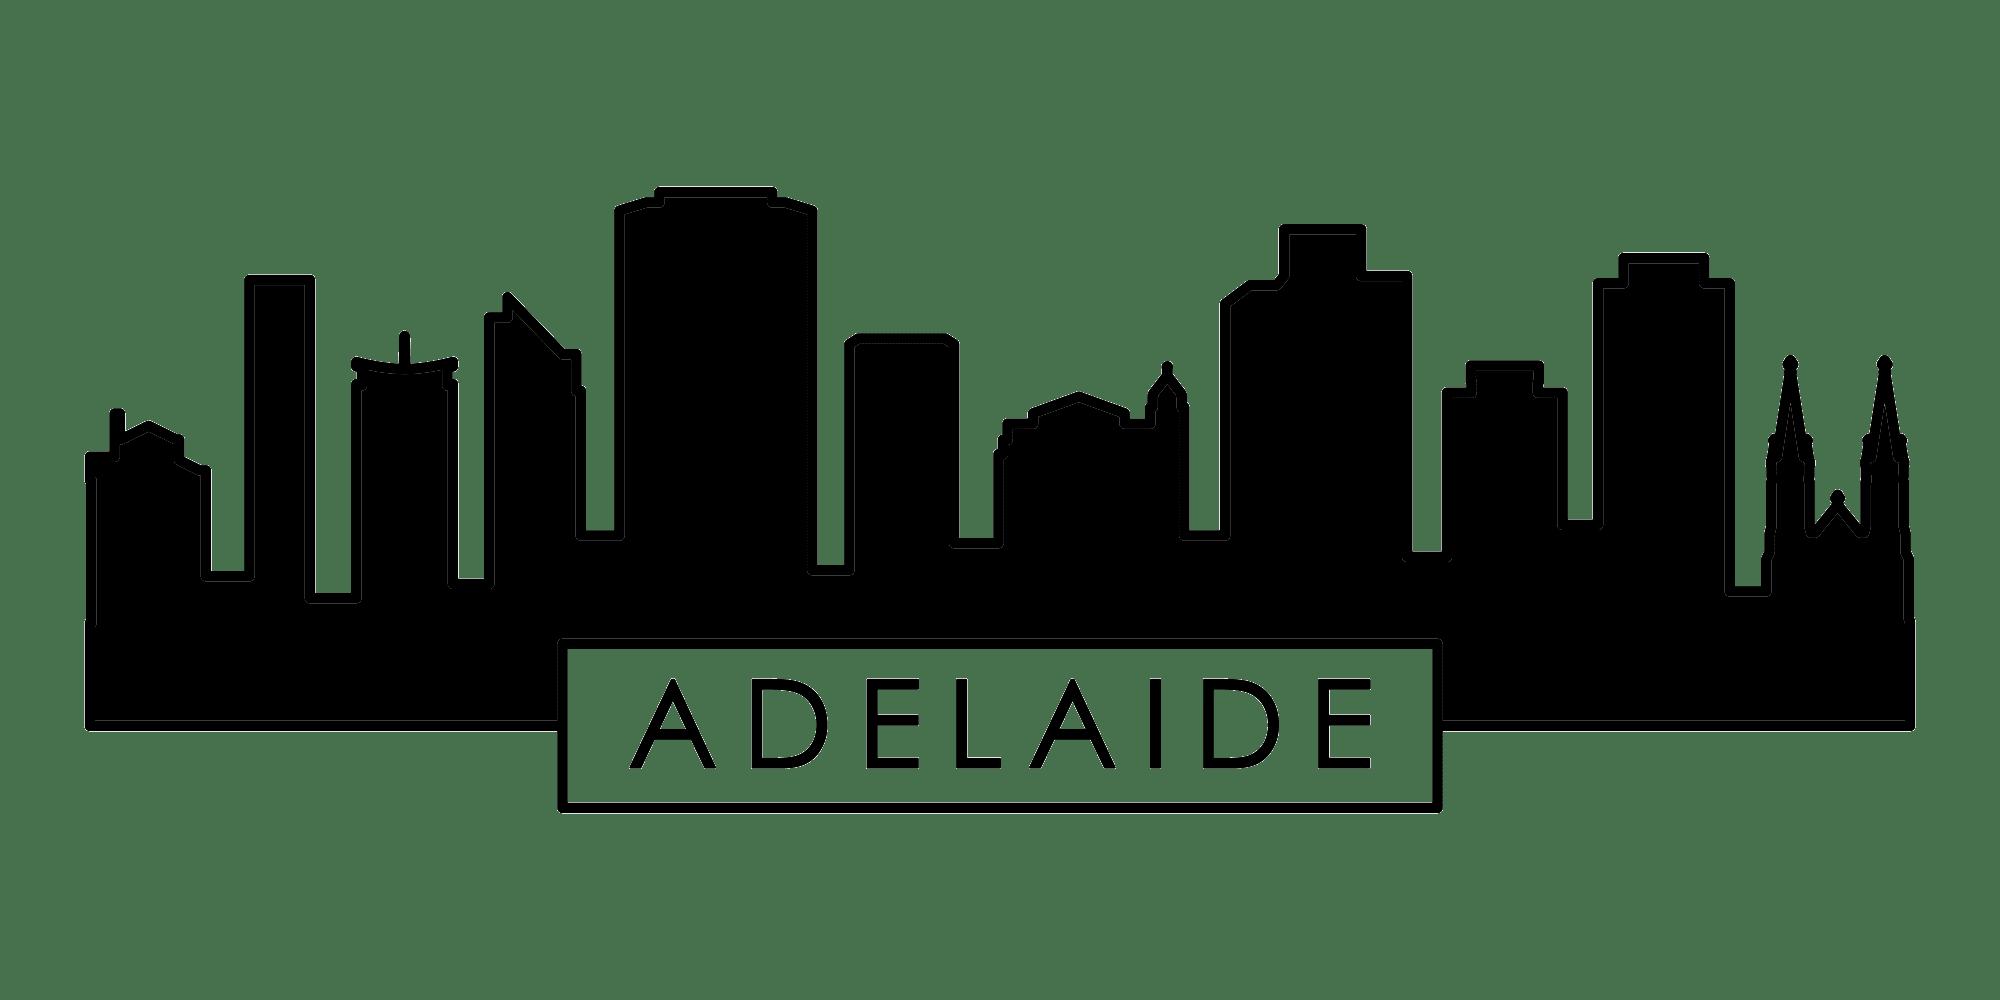 Adelaide office